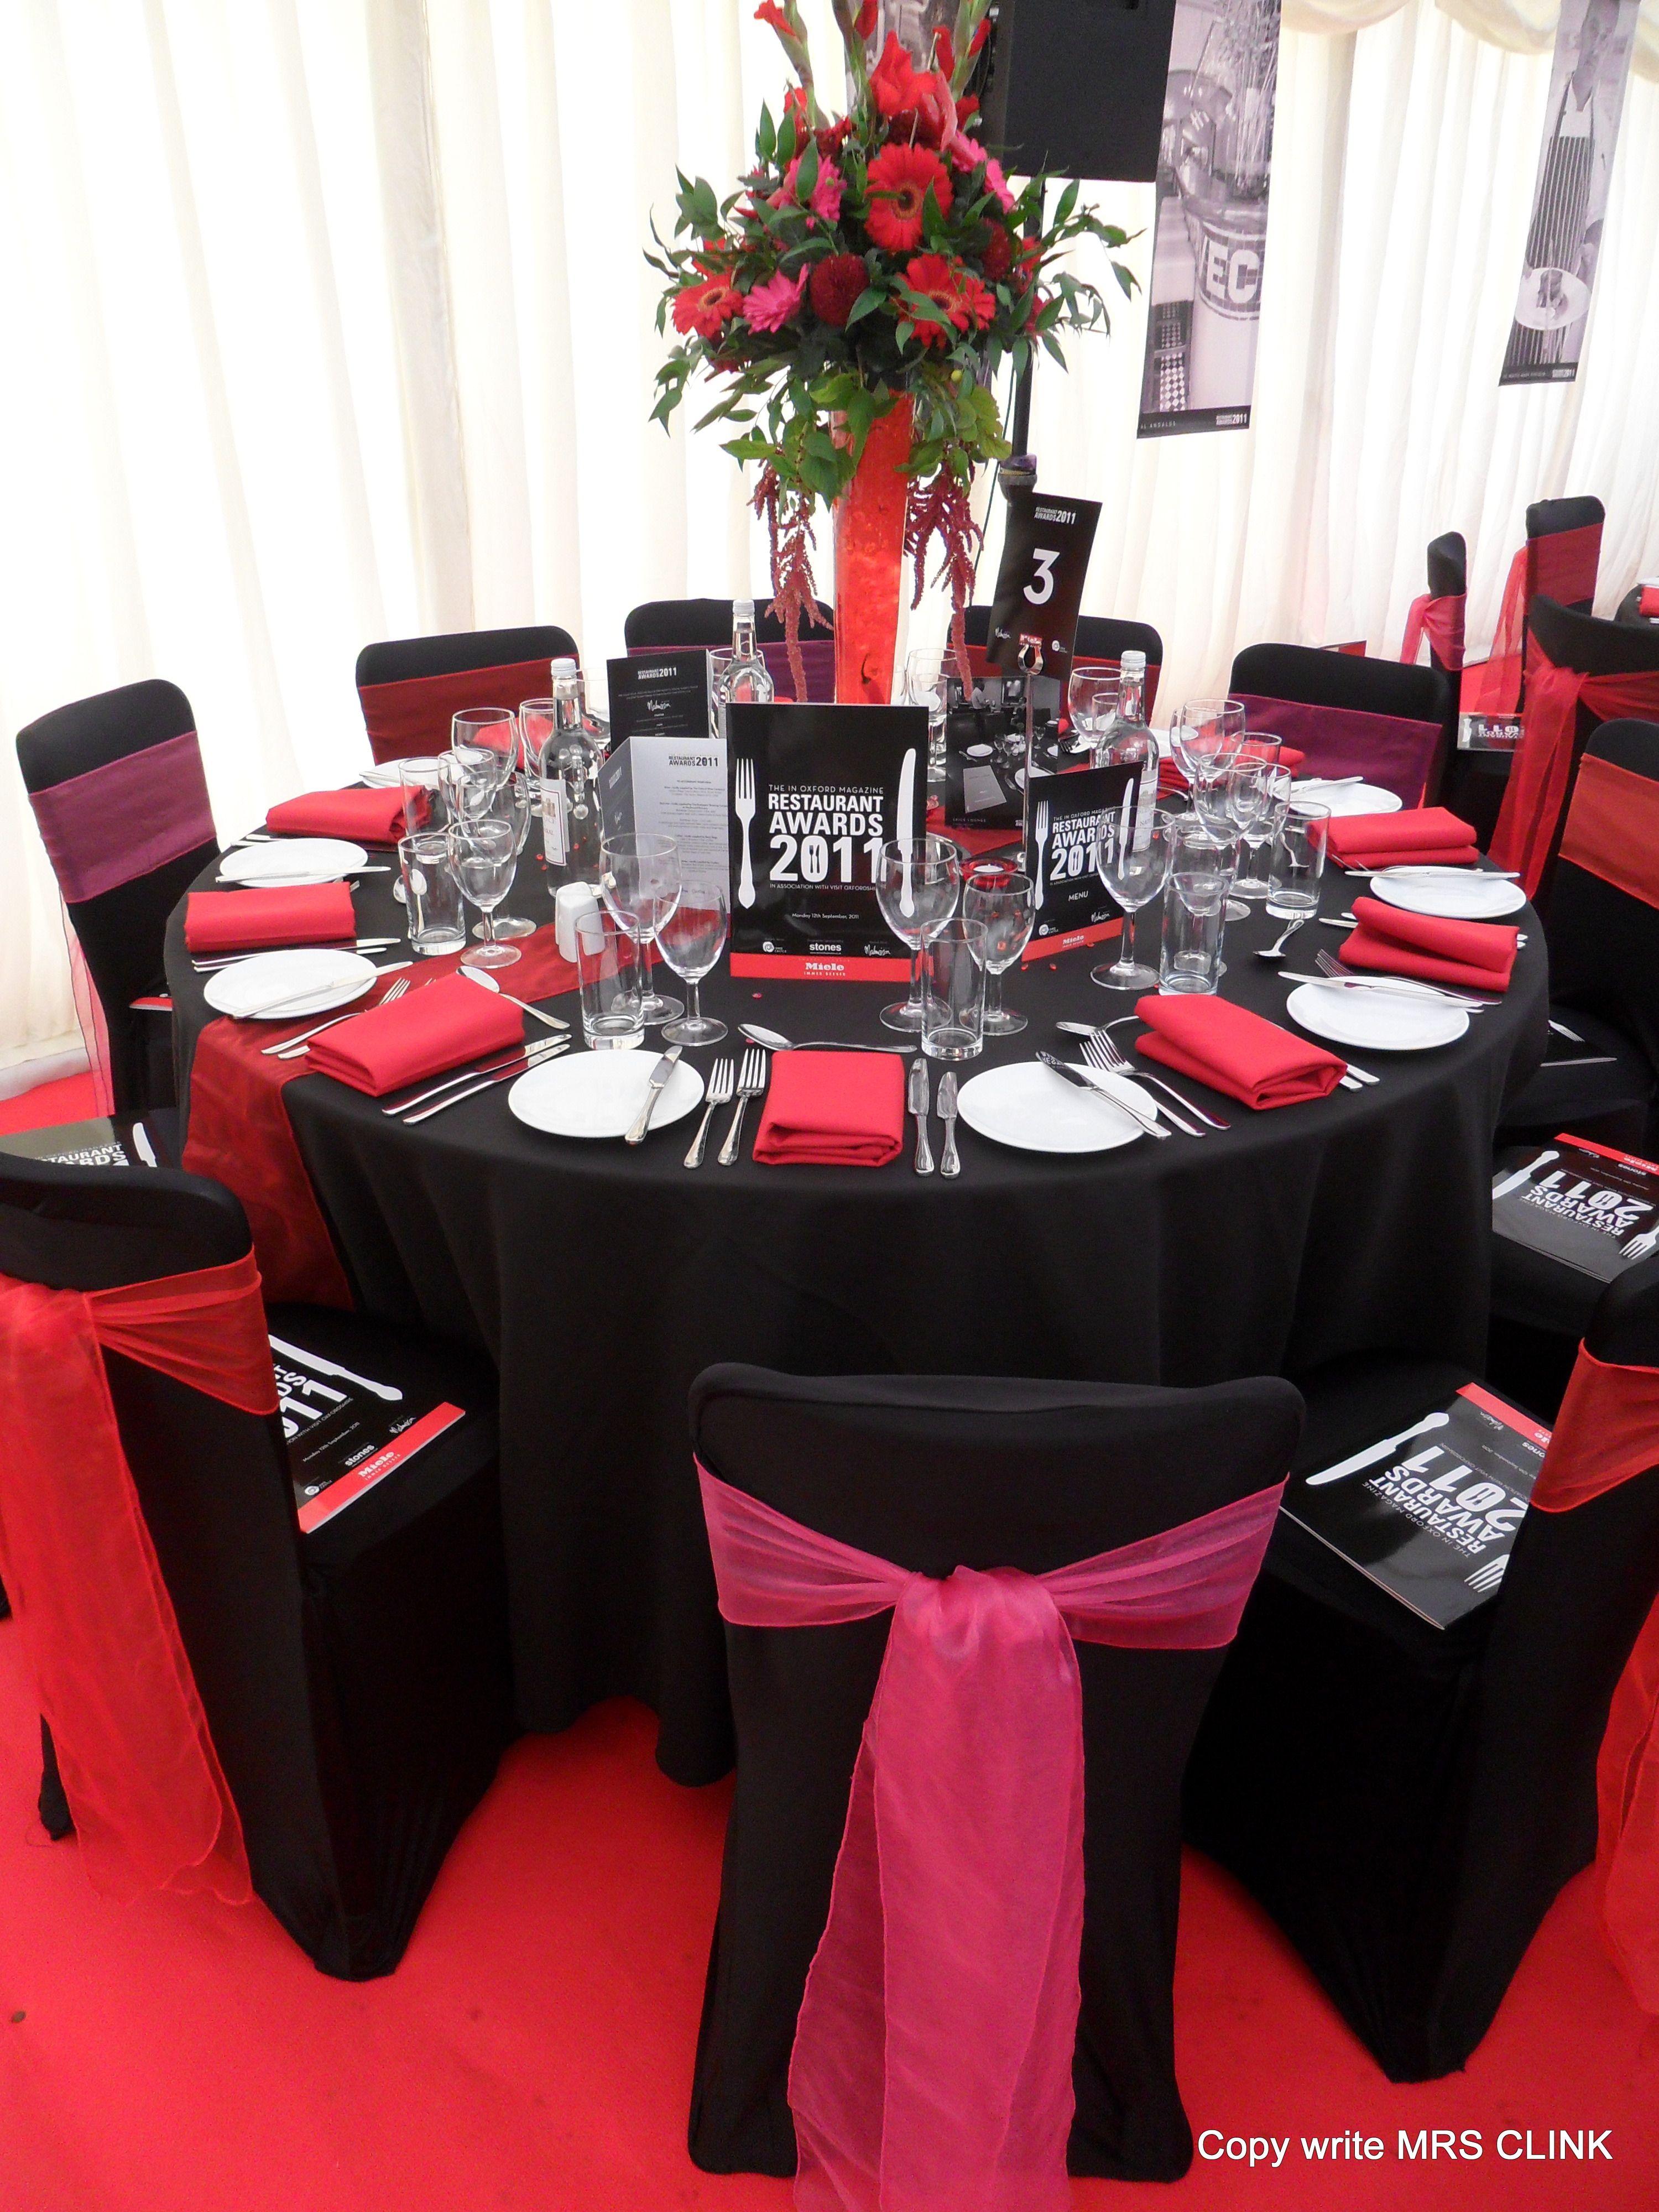 Restaurant Awards Styled By The Award Winning Venue Decor